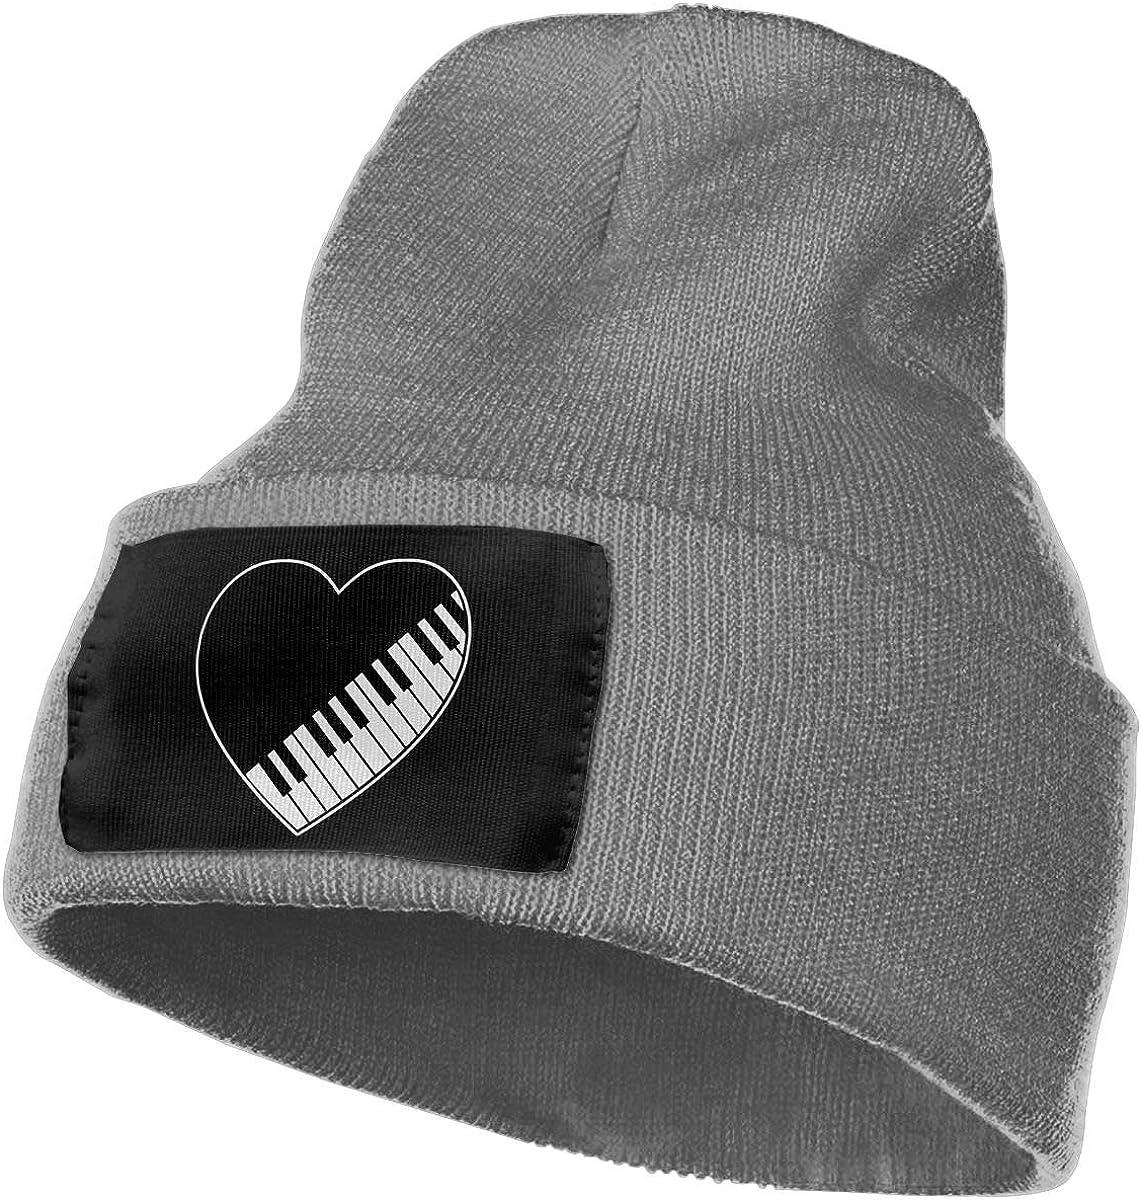 Piano Keys Heart Warm Ski Cap WHOO93@Y Mens Womens 100/% Acrylic Knit Hat Cap